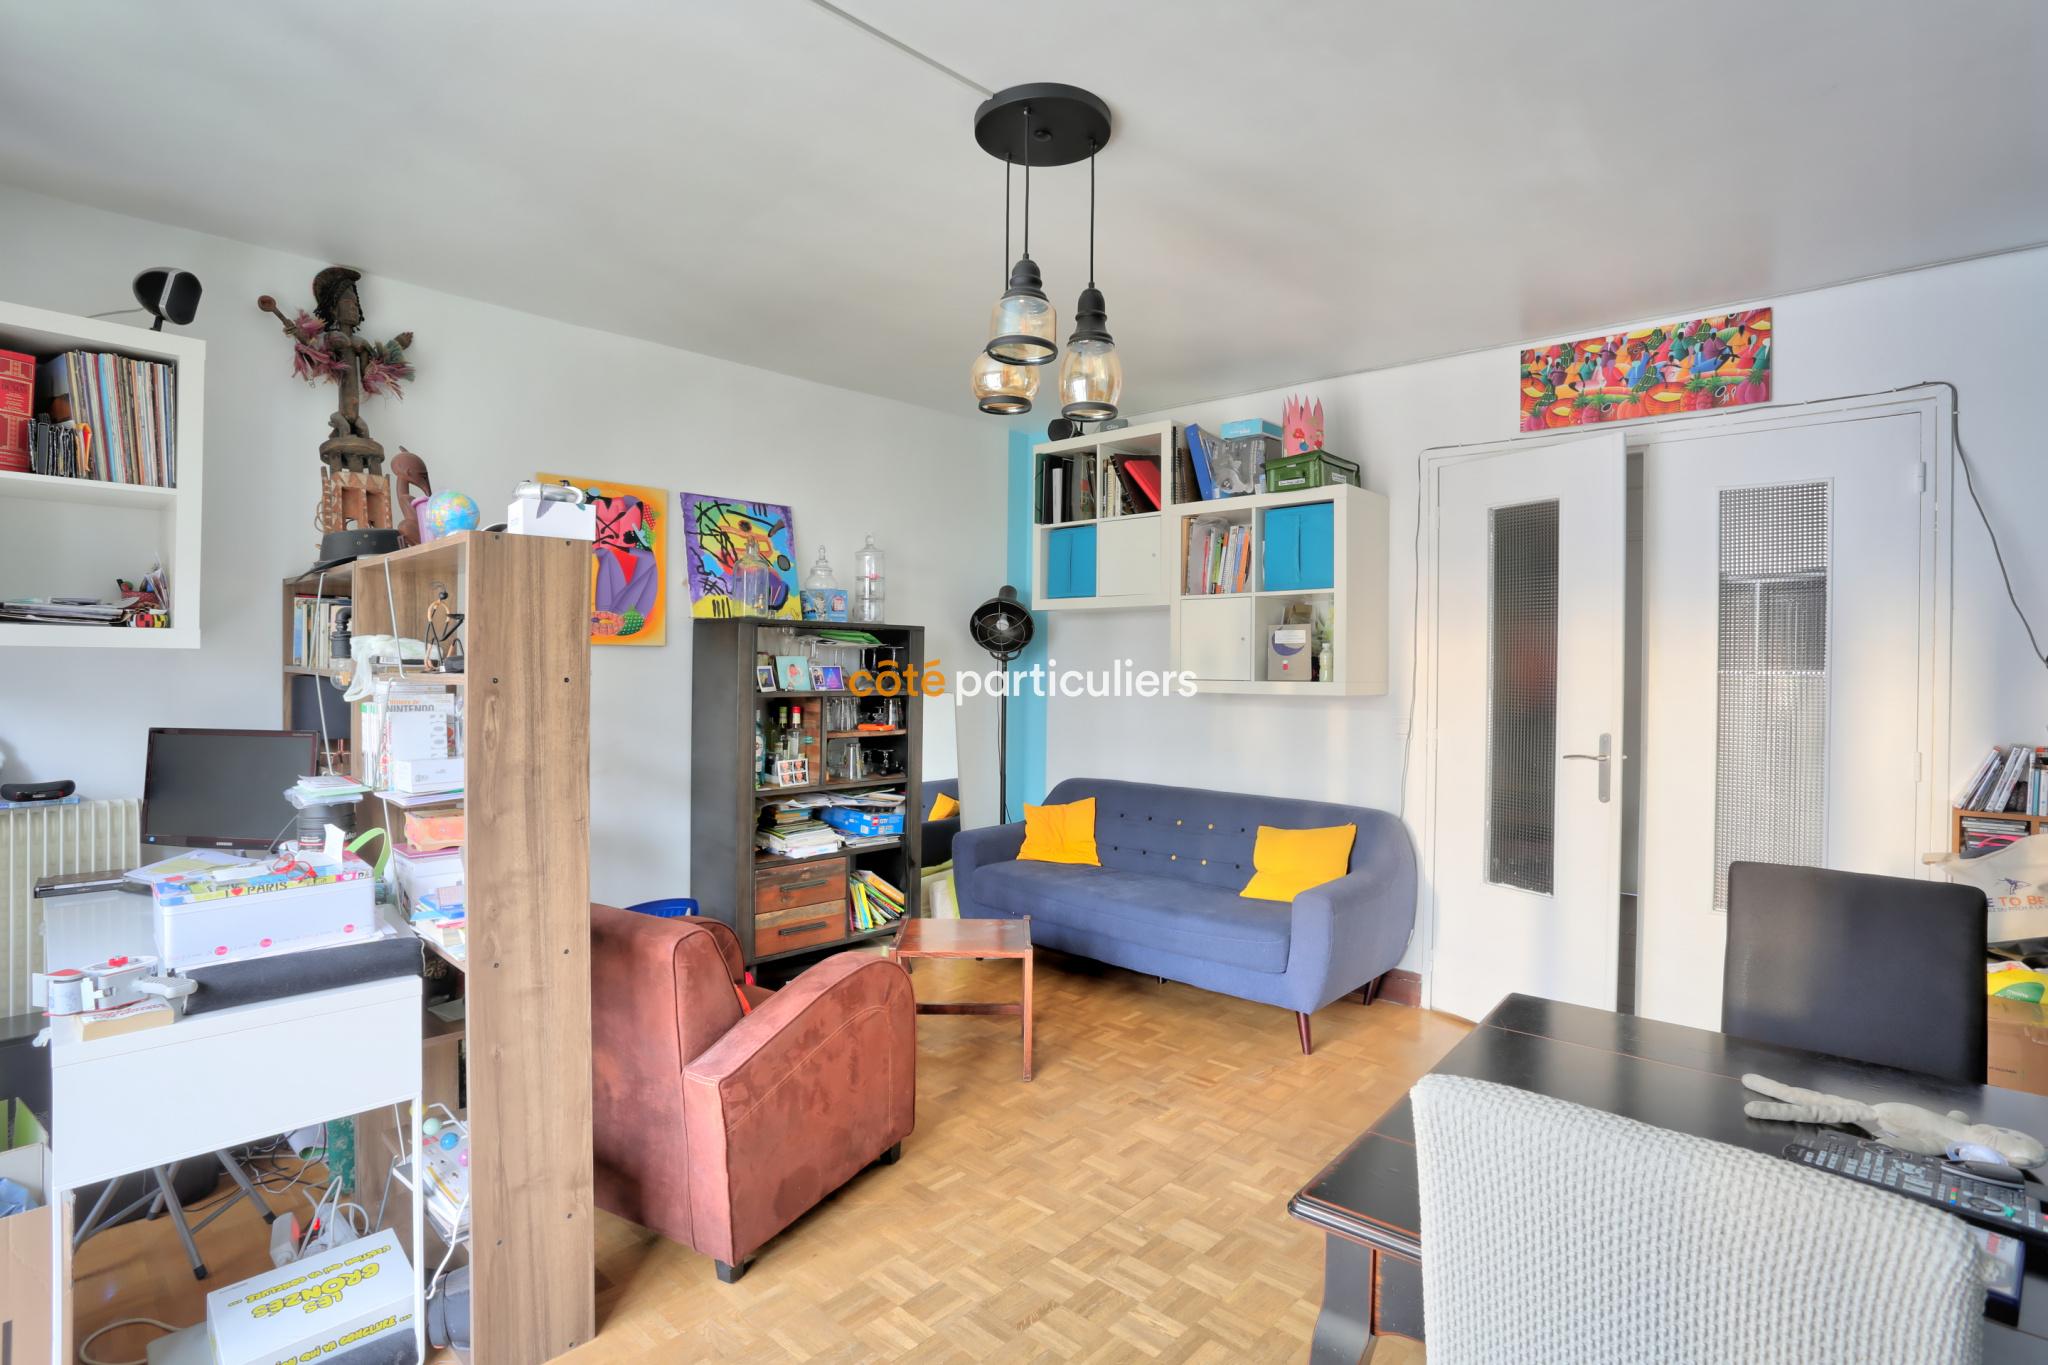 vente metro marcel sembat. Black Bedroom Furniture Sets. Home Design Ideas